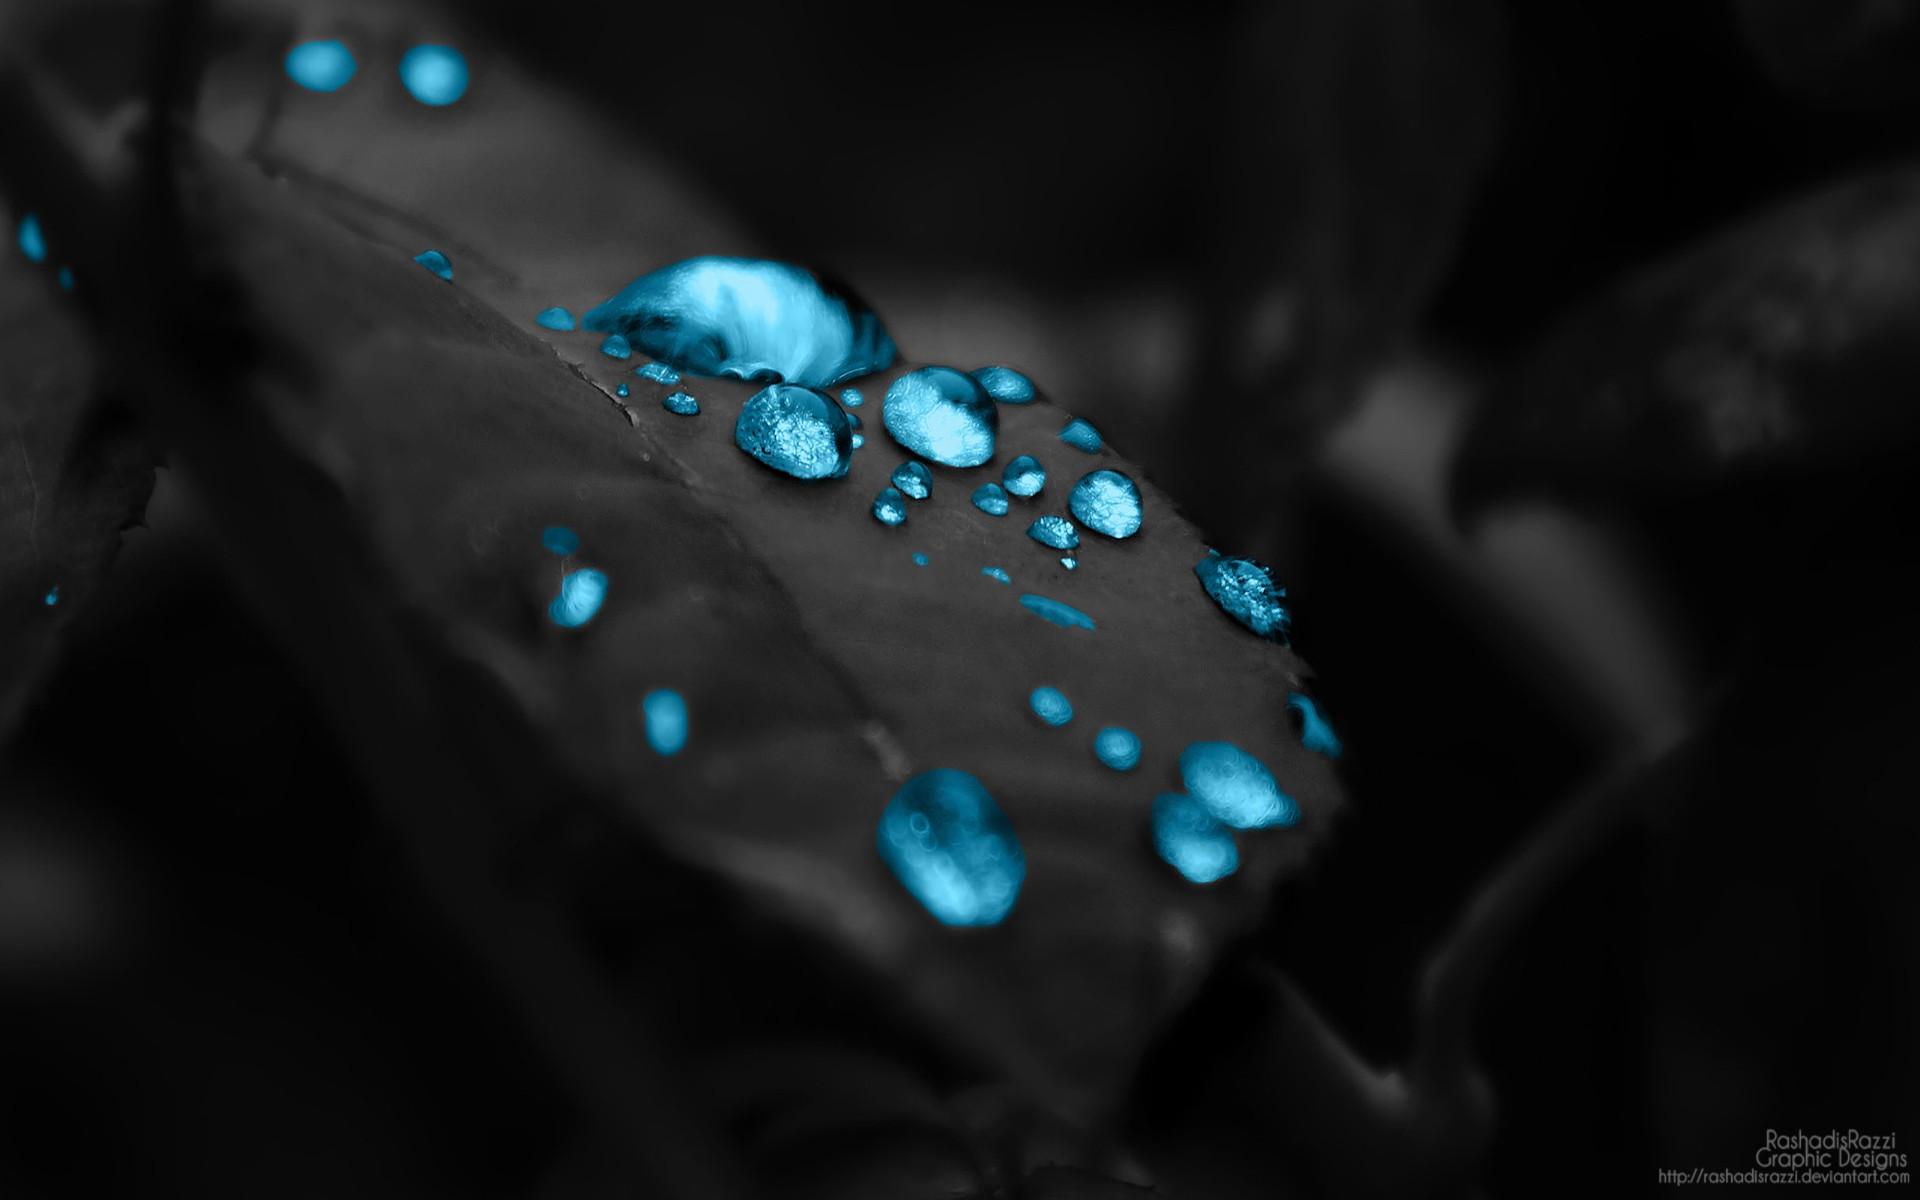 Leaves black monochrome water nature photography green blue light color flower eye drop darkness petal jewellery